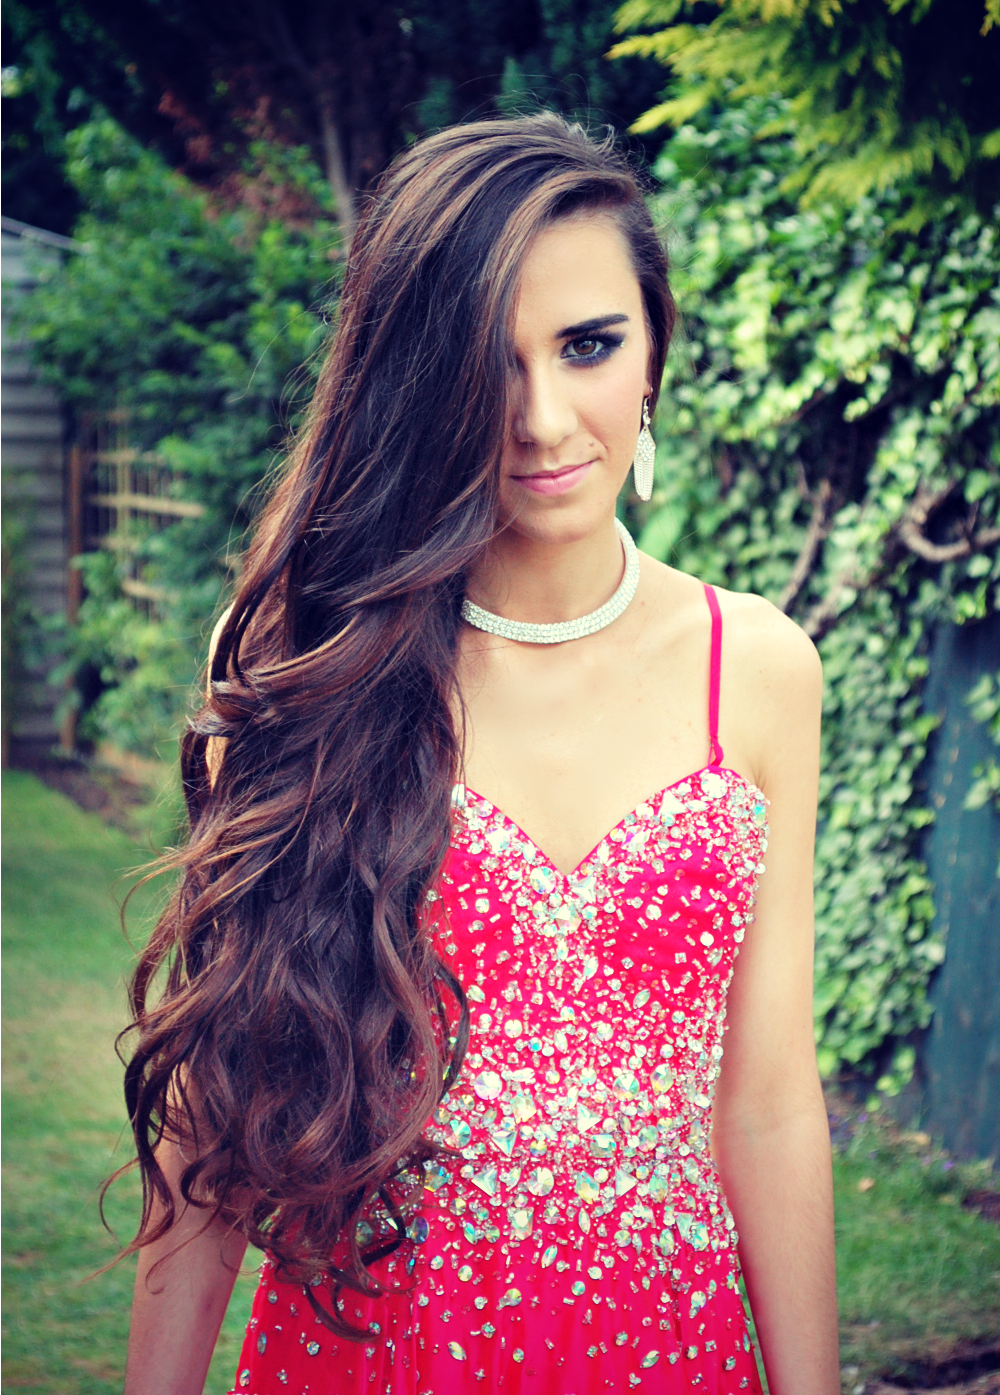 Long curly hair prom phieus salon hair pinterest long curly